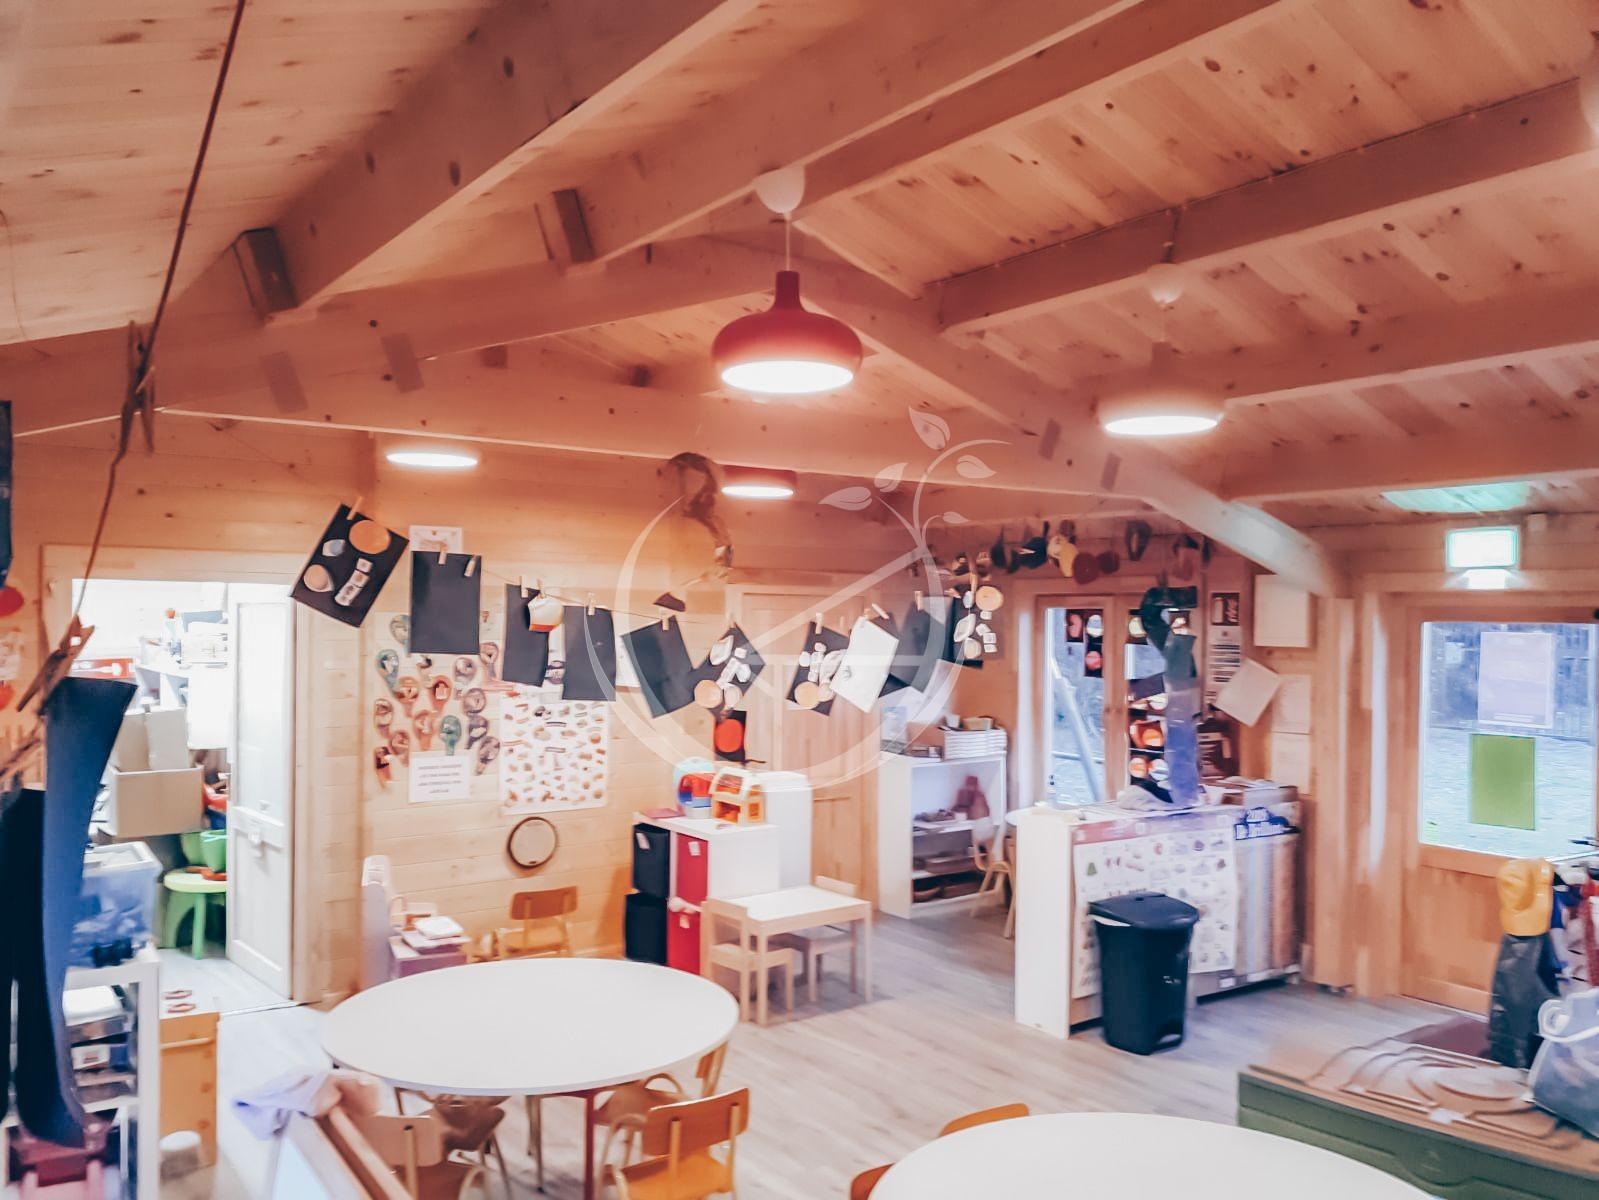 Building Log Cabins For Schools Foto 6